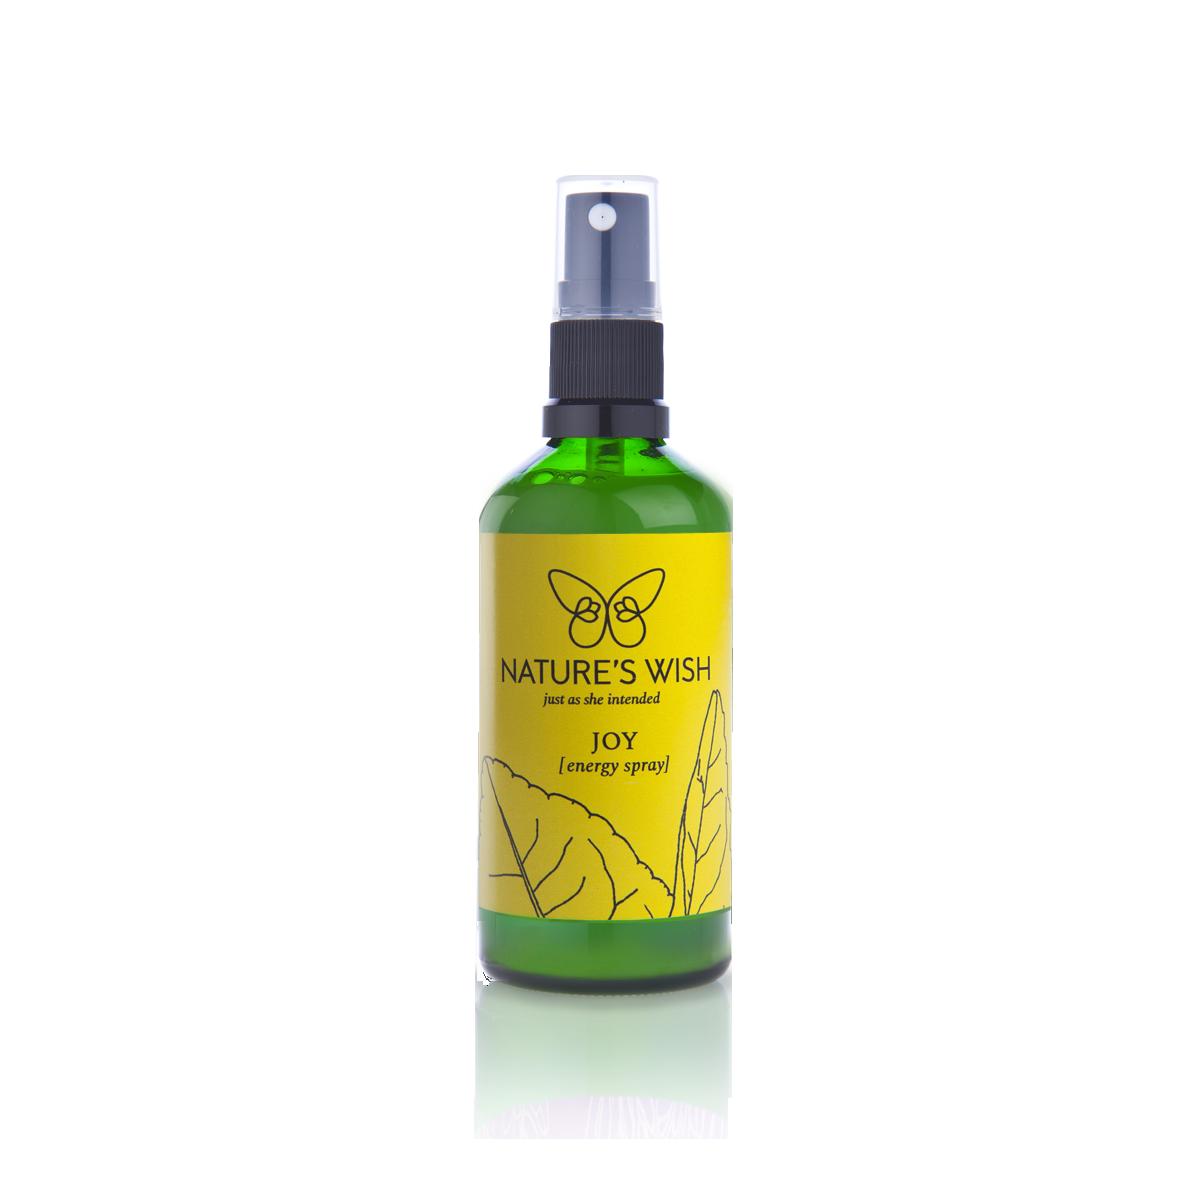 bergamot-lemon-rose-geranium-roman-chamomil-ylang-ylang-sweet-pea-angels-trumpet-willow-crystal-essences-rose-quartz-flower-essence-aromatherapy-energy-spray